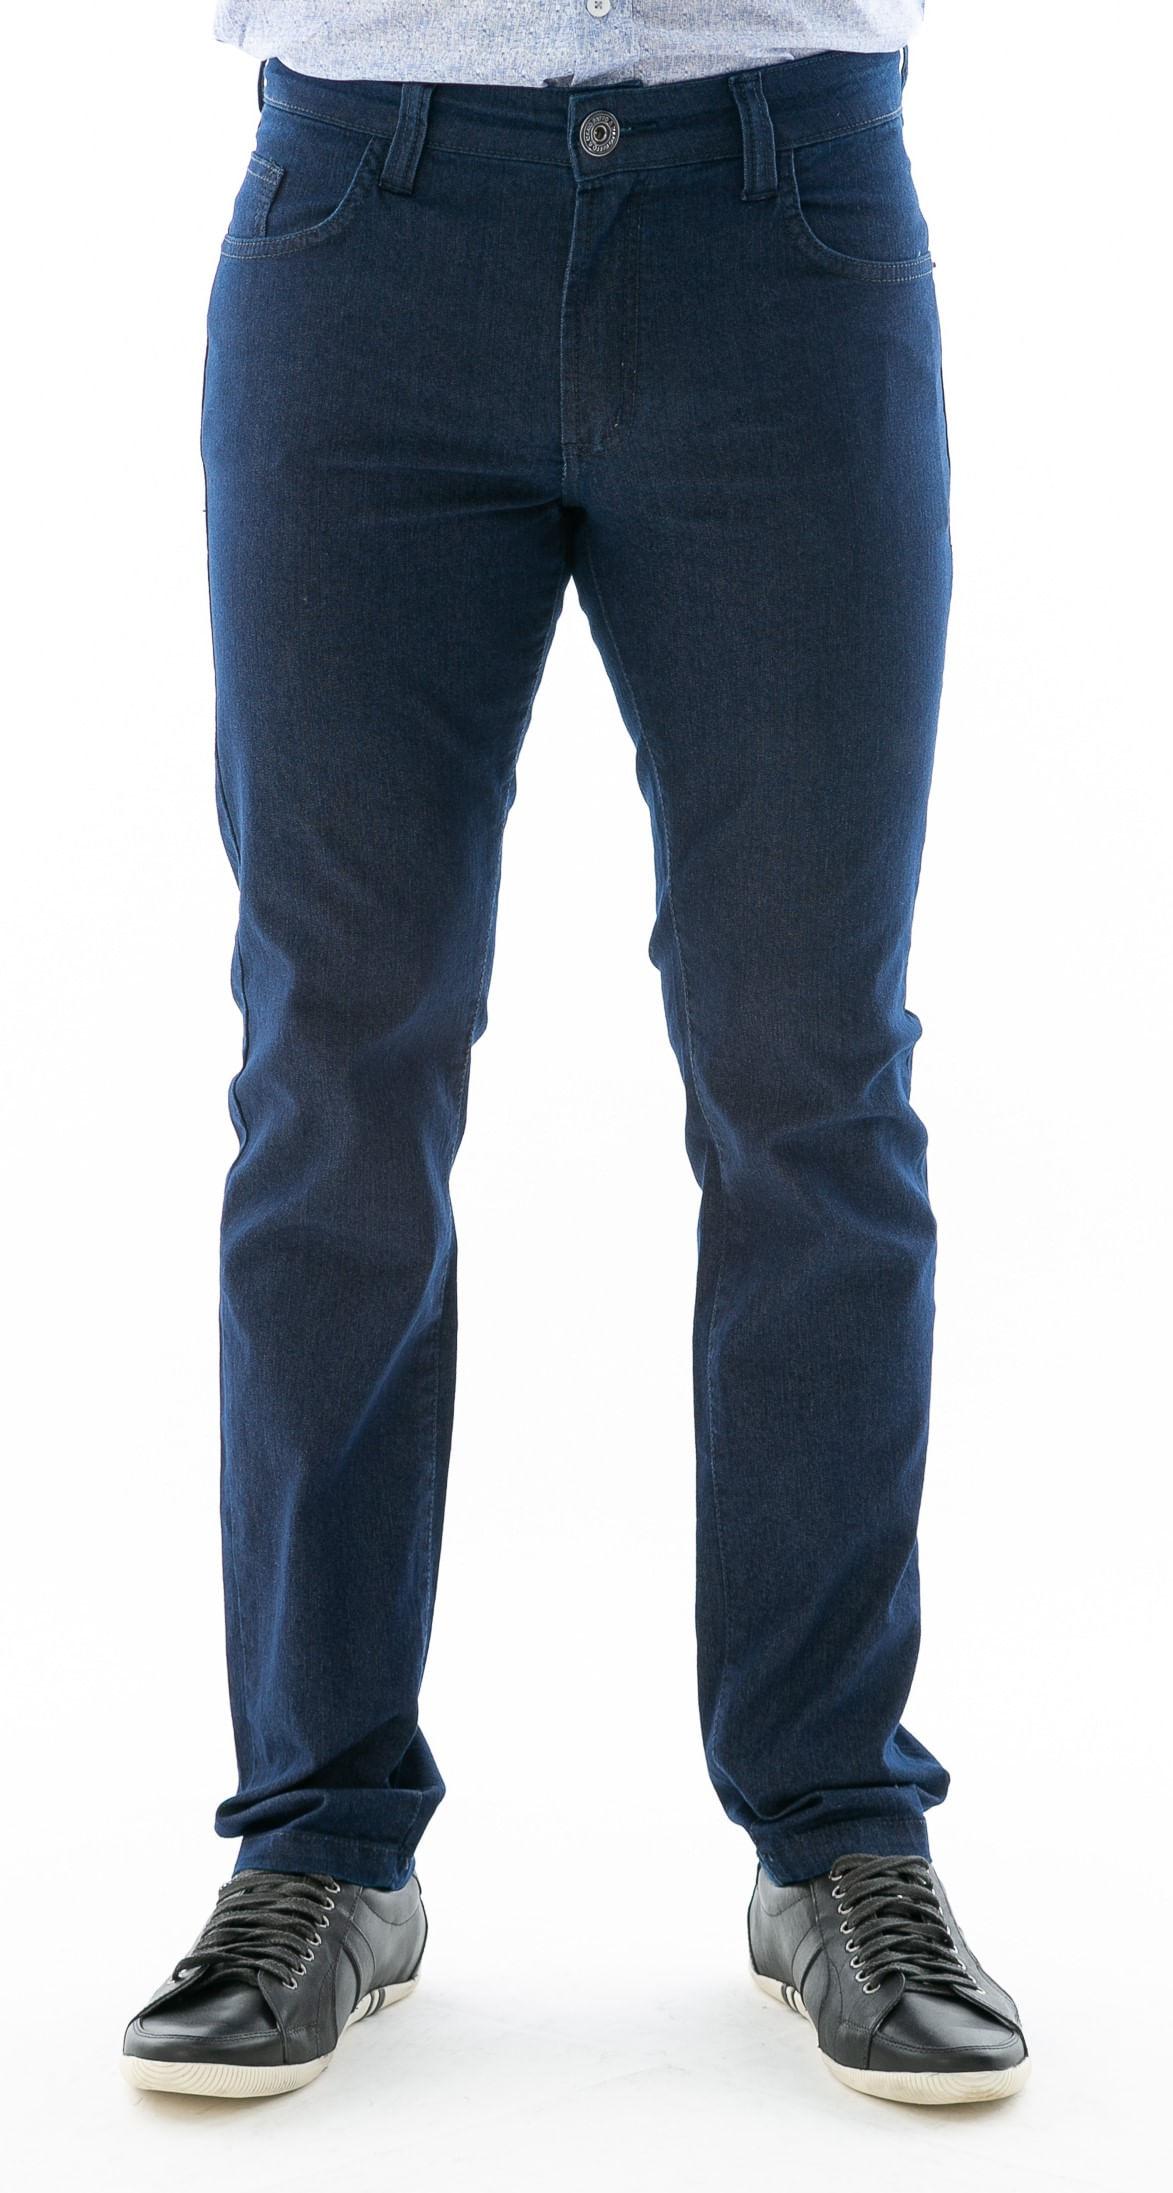 798041401e Calça Jeans Masculina Slim Fit - lojafattoamano